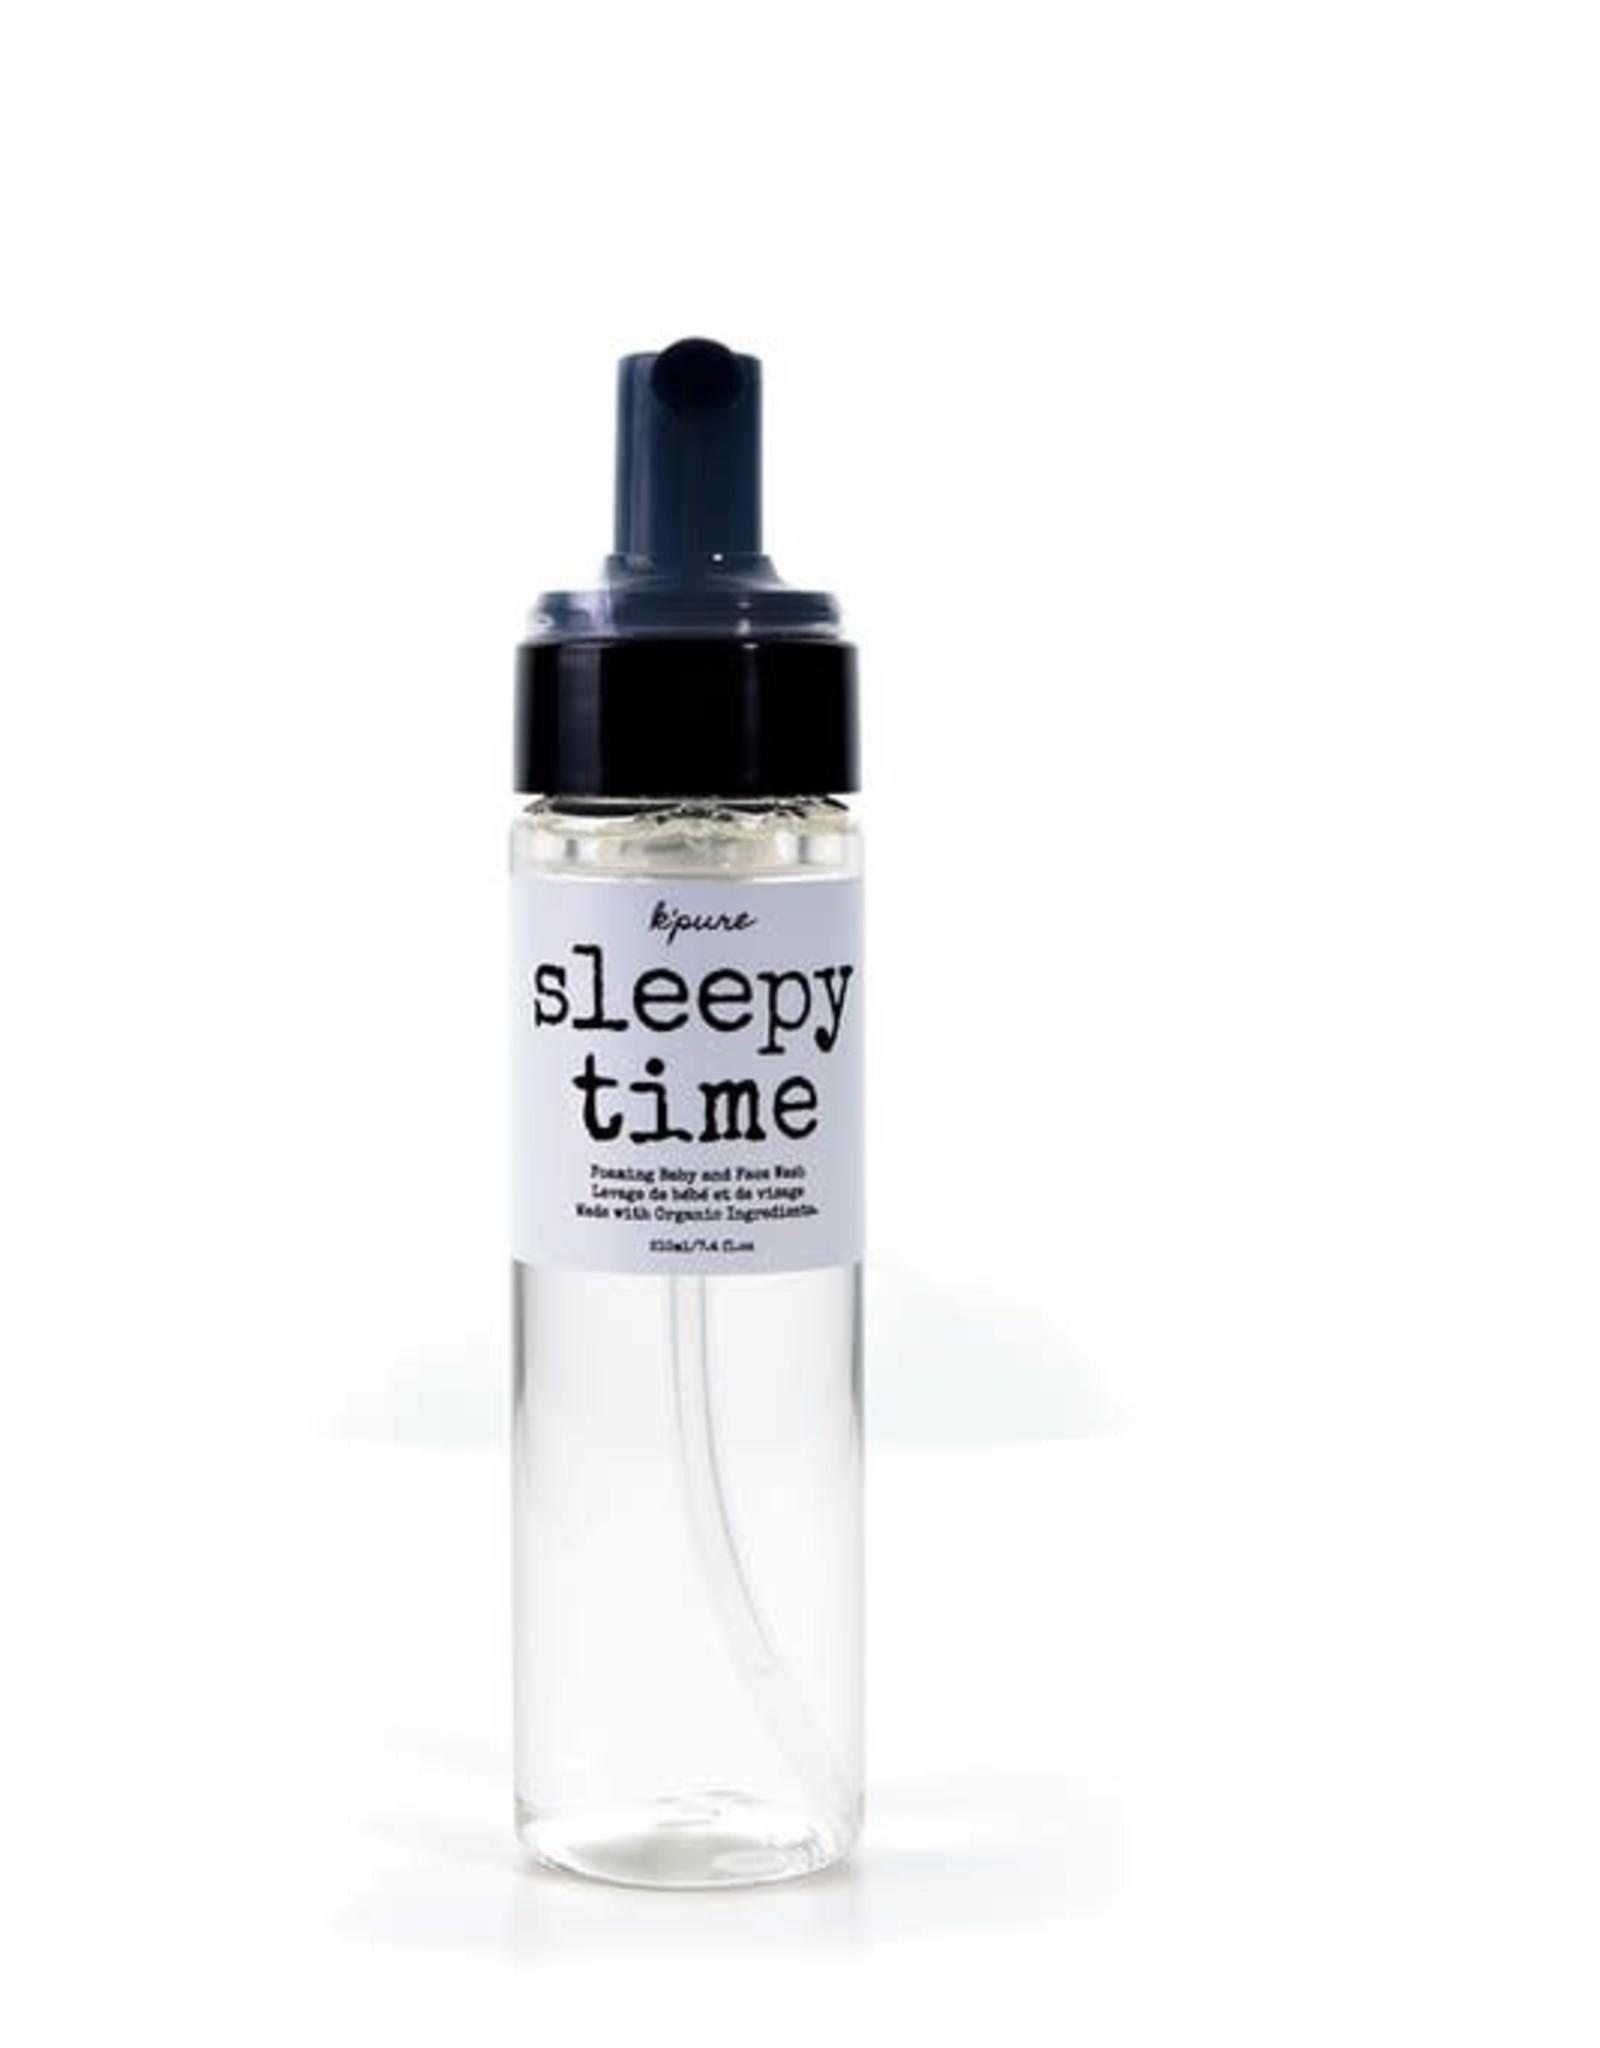 K'PURE Sleepy Time Foaming wash, 210ml